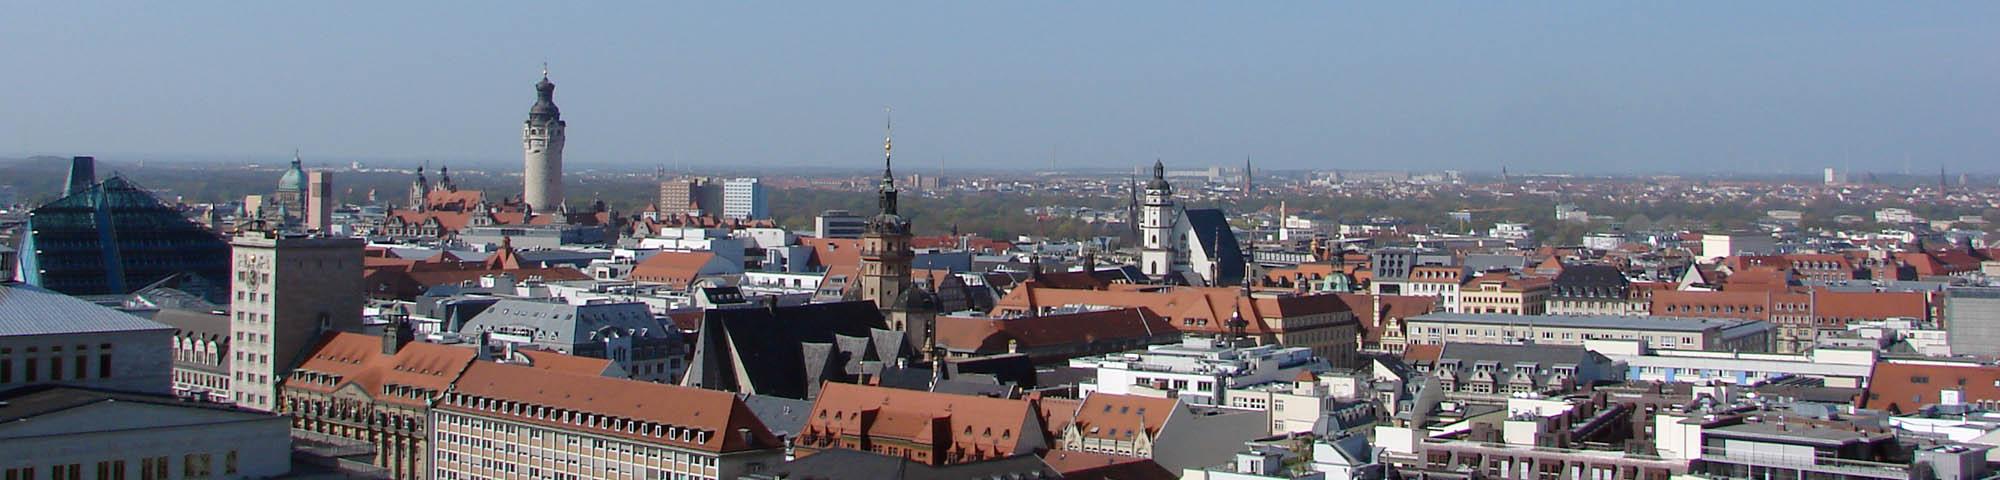 Stadtansicht Leipzig, Foto Kerstin Krumbholz